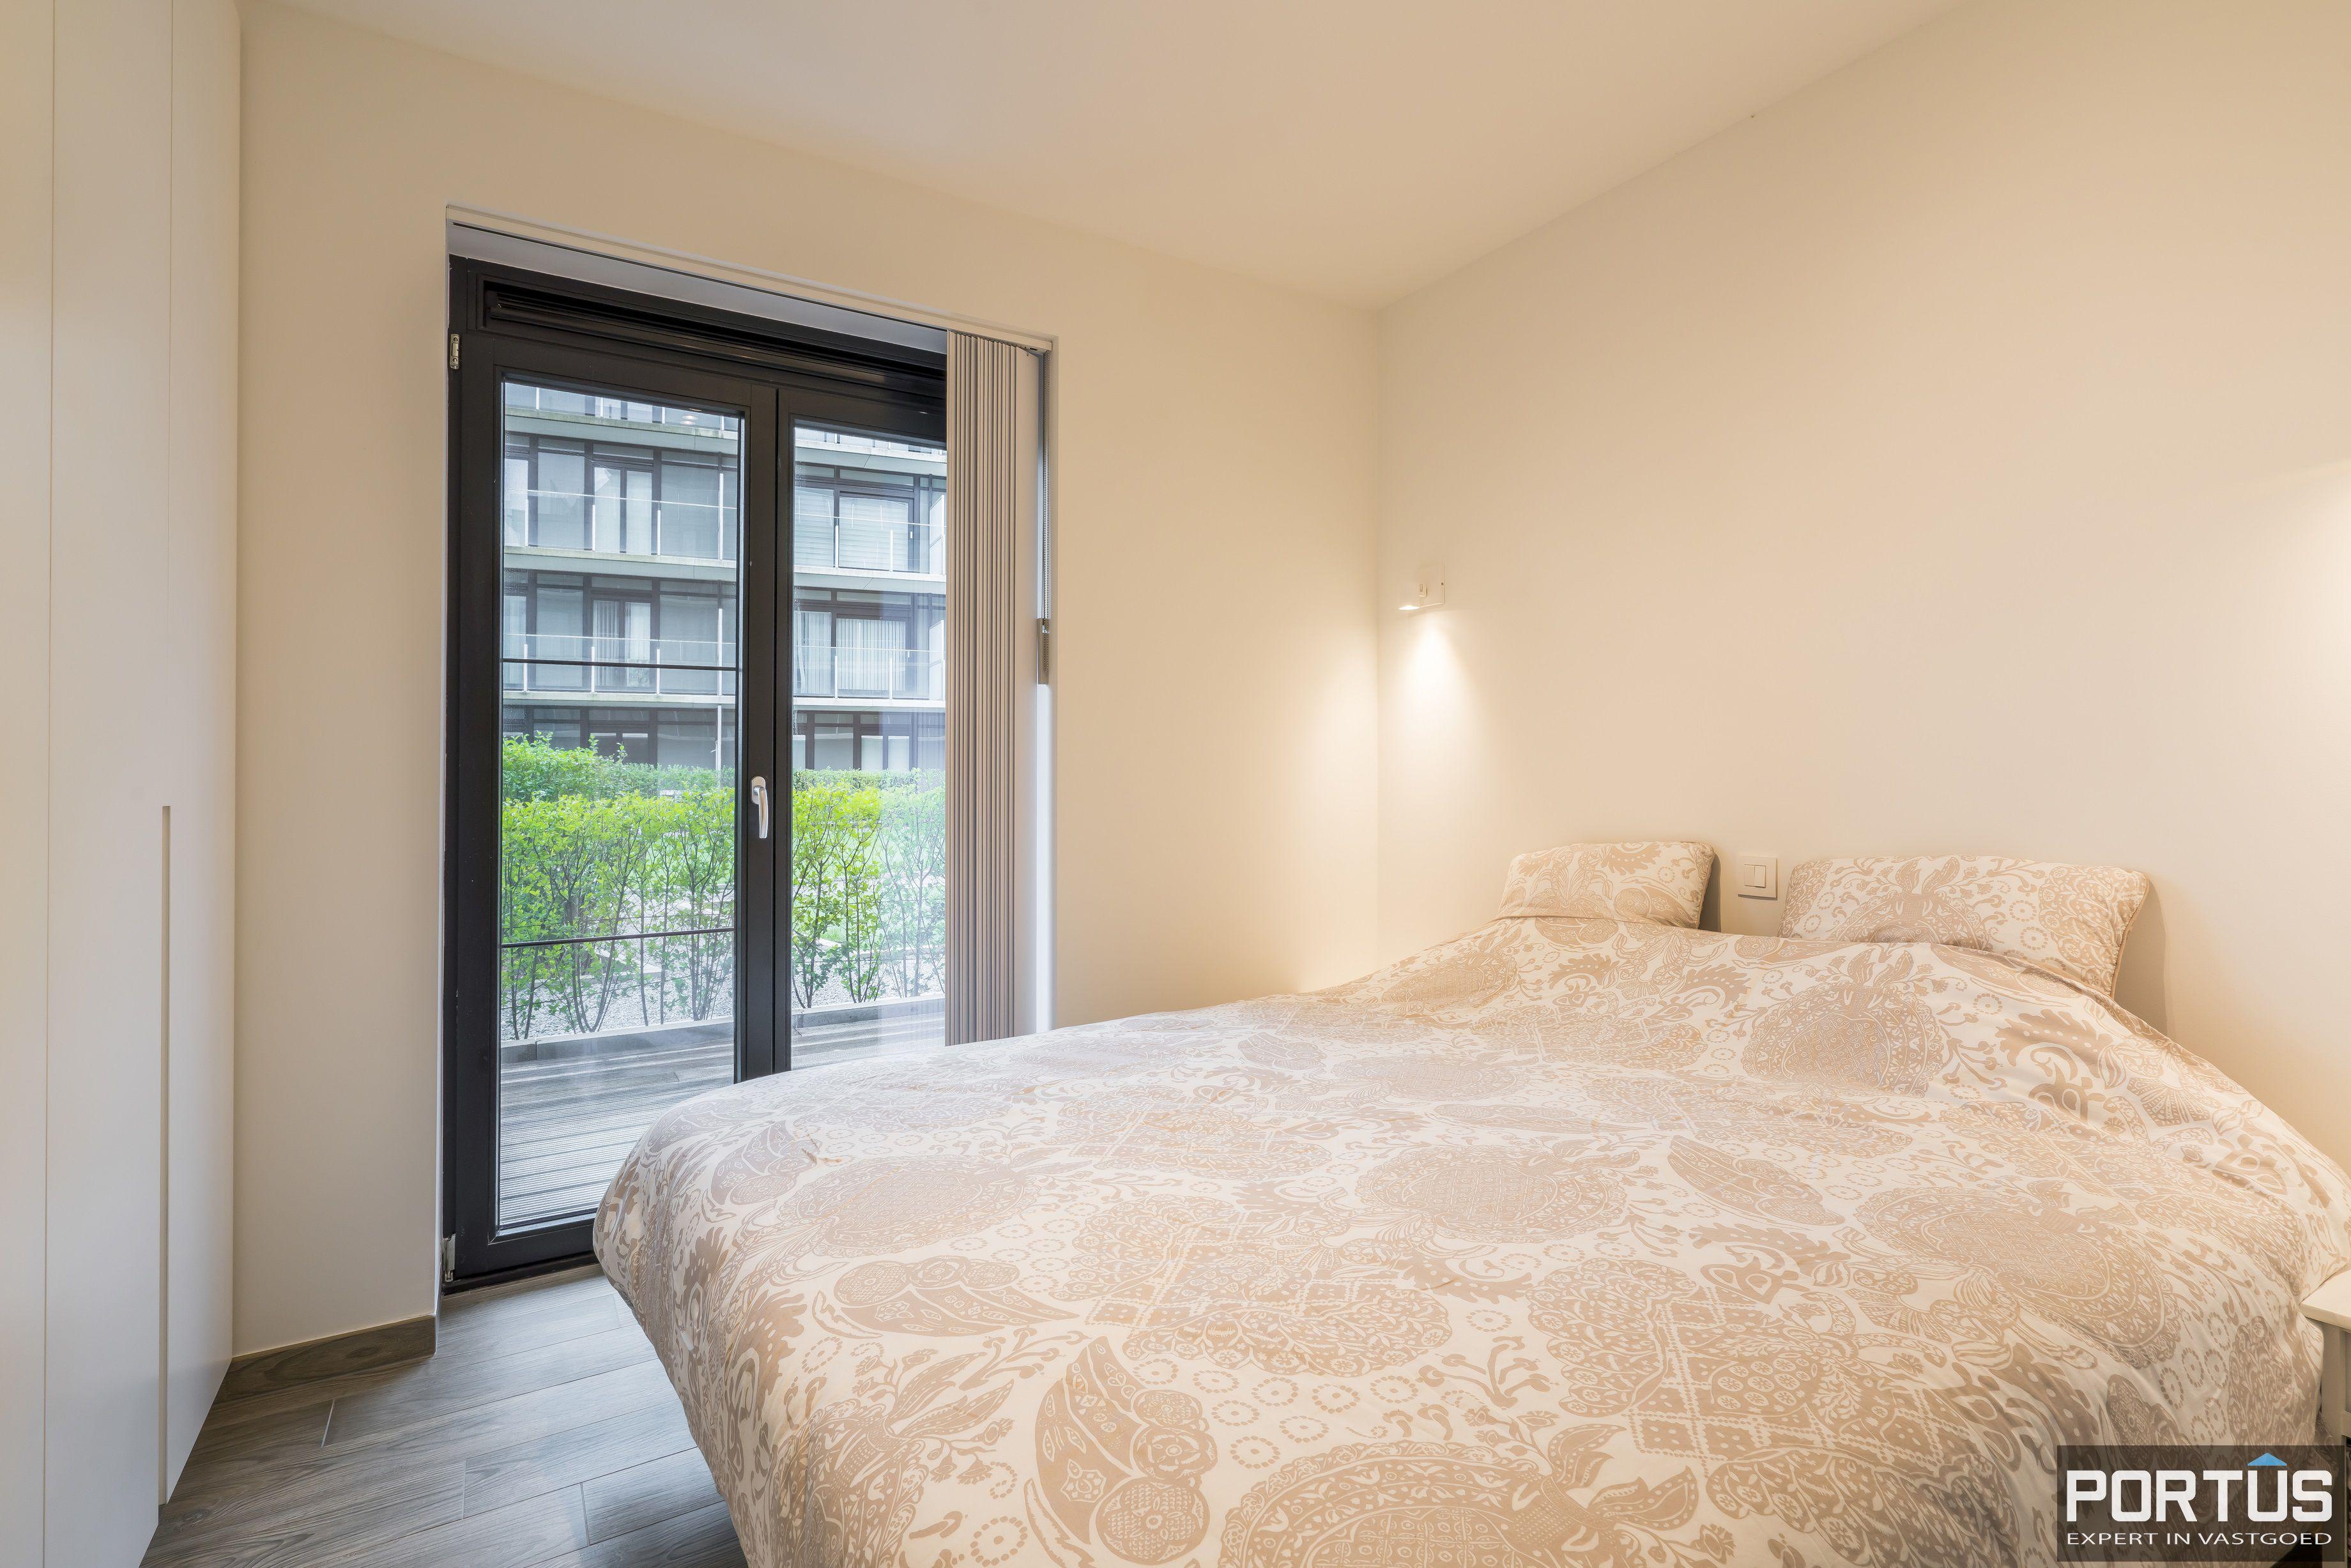 Appartement te koop met 2 slaapkamers in Residentie Waterfront te Nieuwpoort - 11868